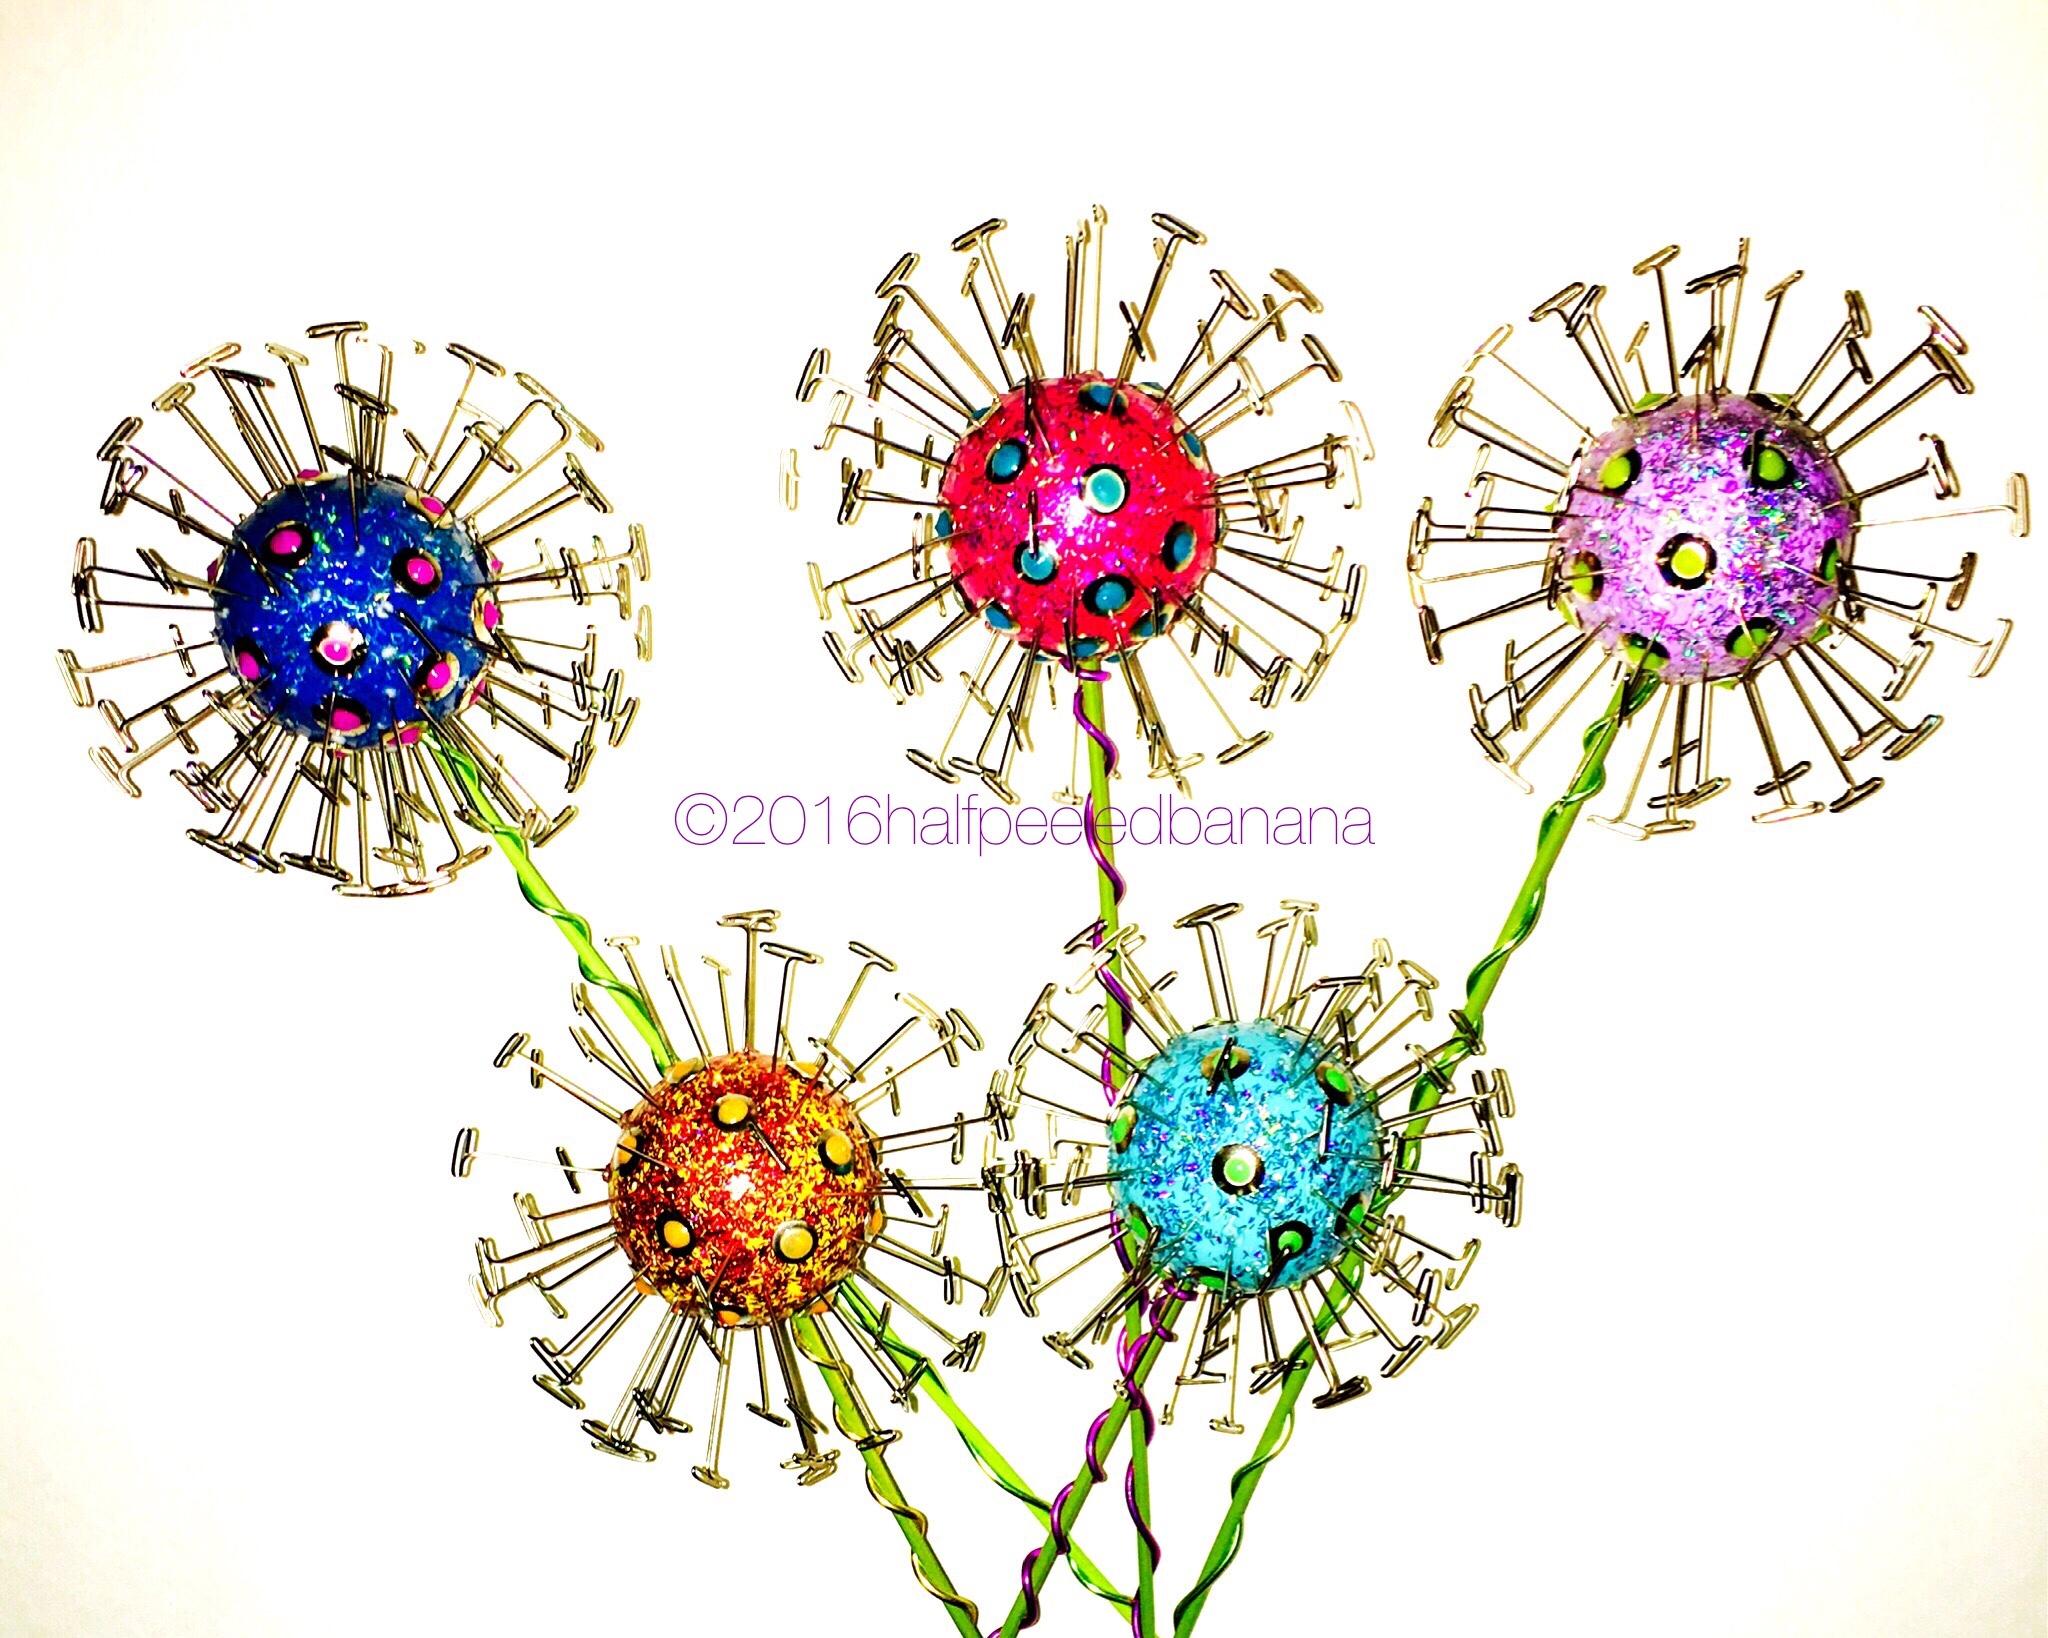 "4.5"" dandi flowers - 5 pack - wood & wire stems"